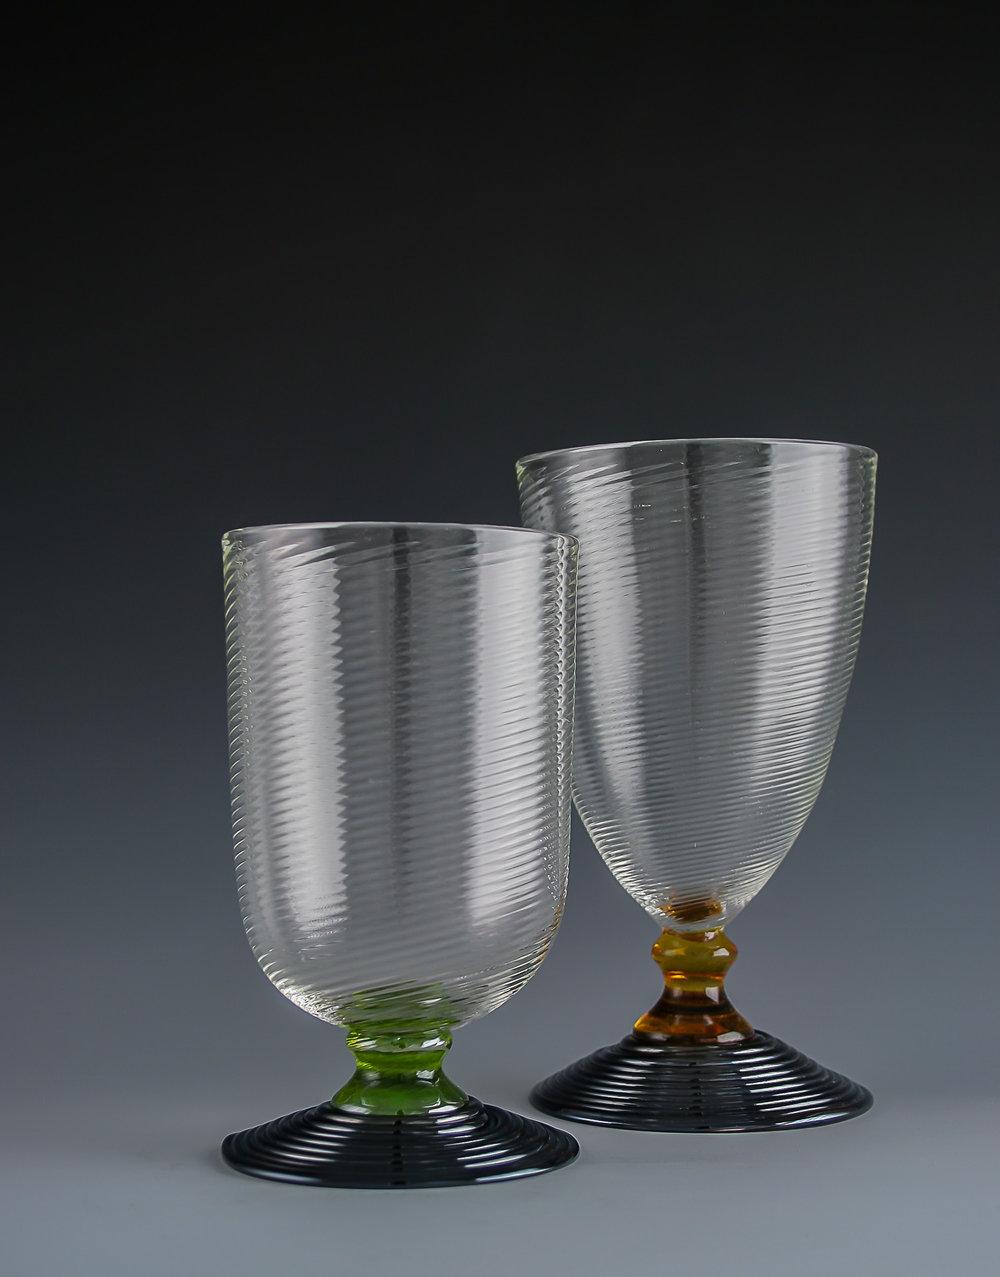 cups-9.jpg